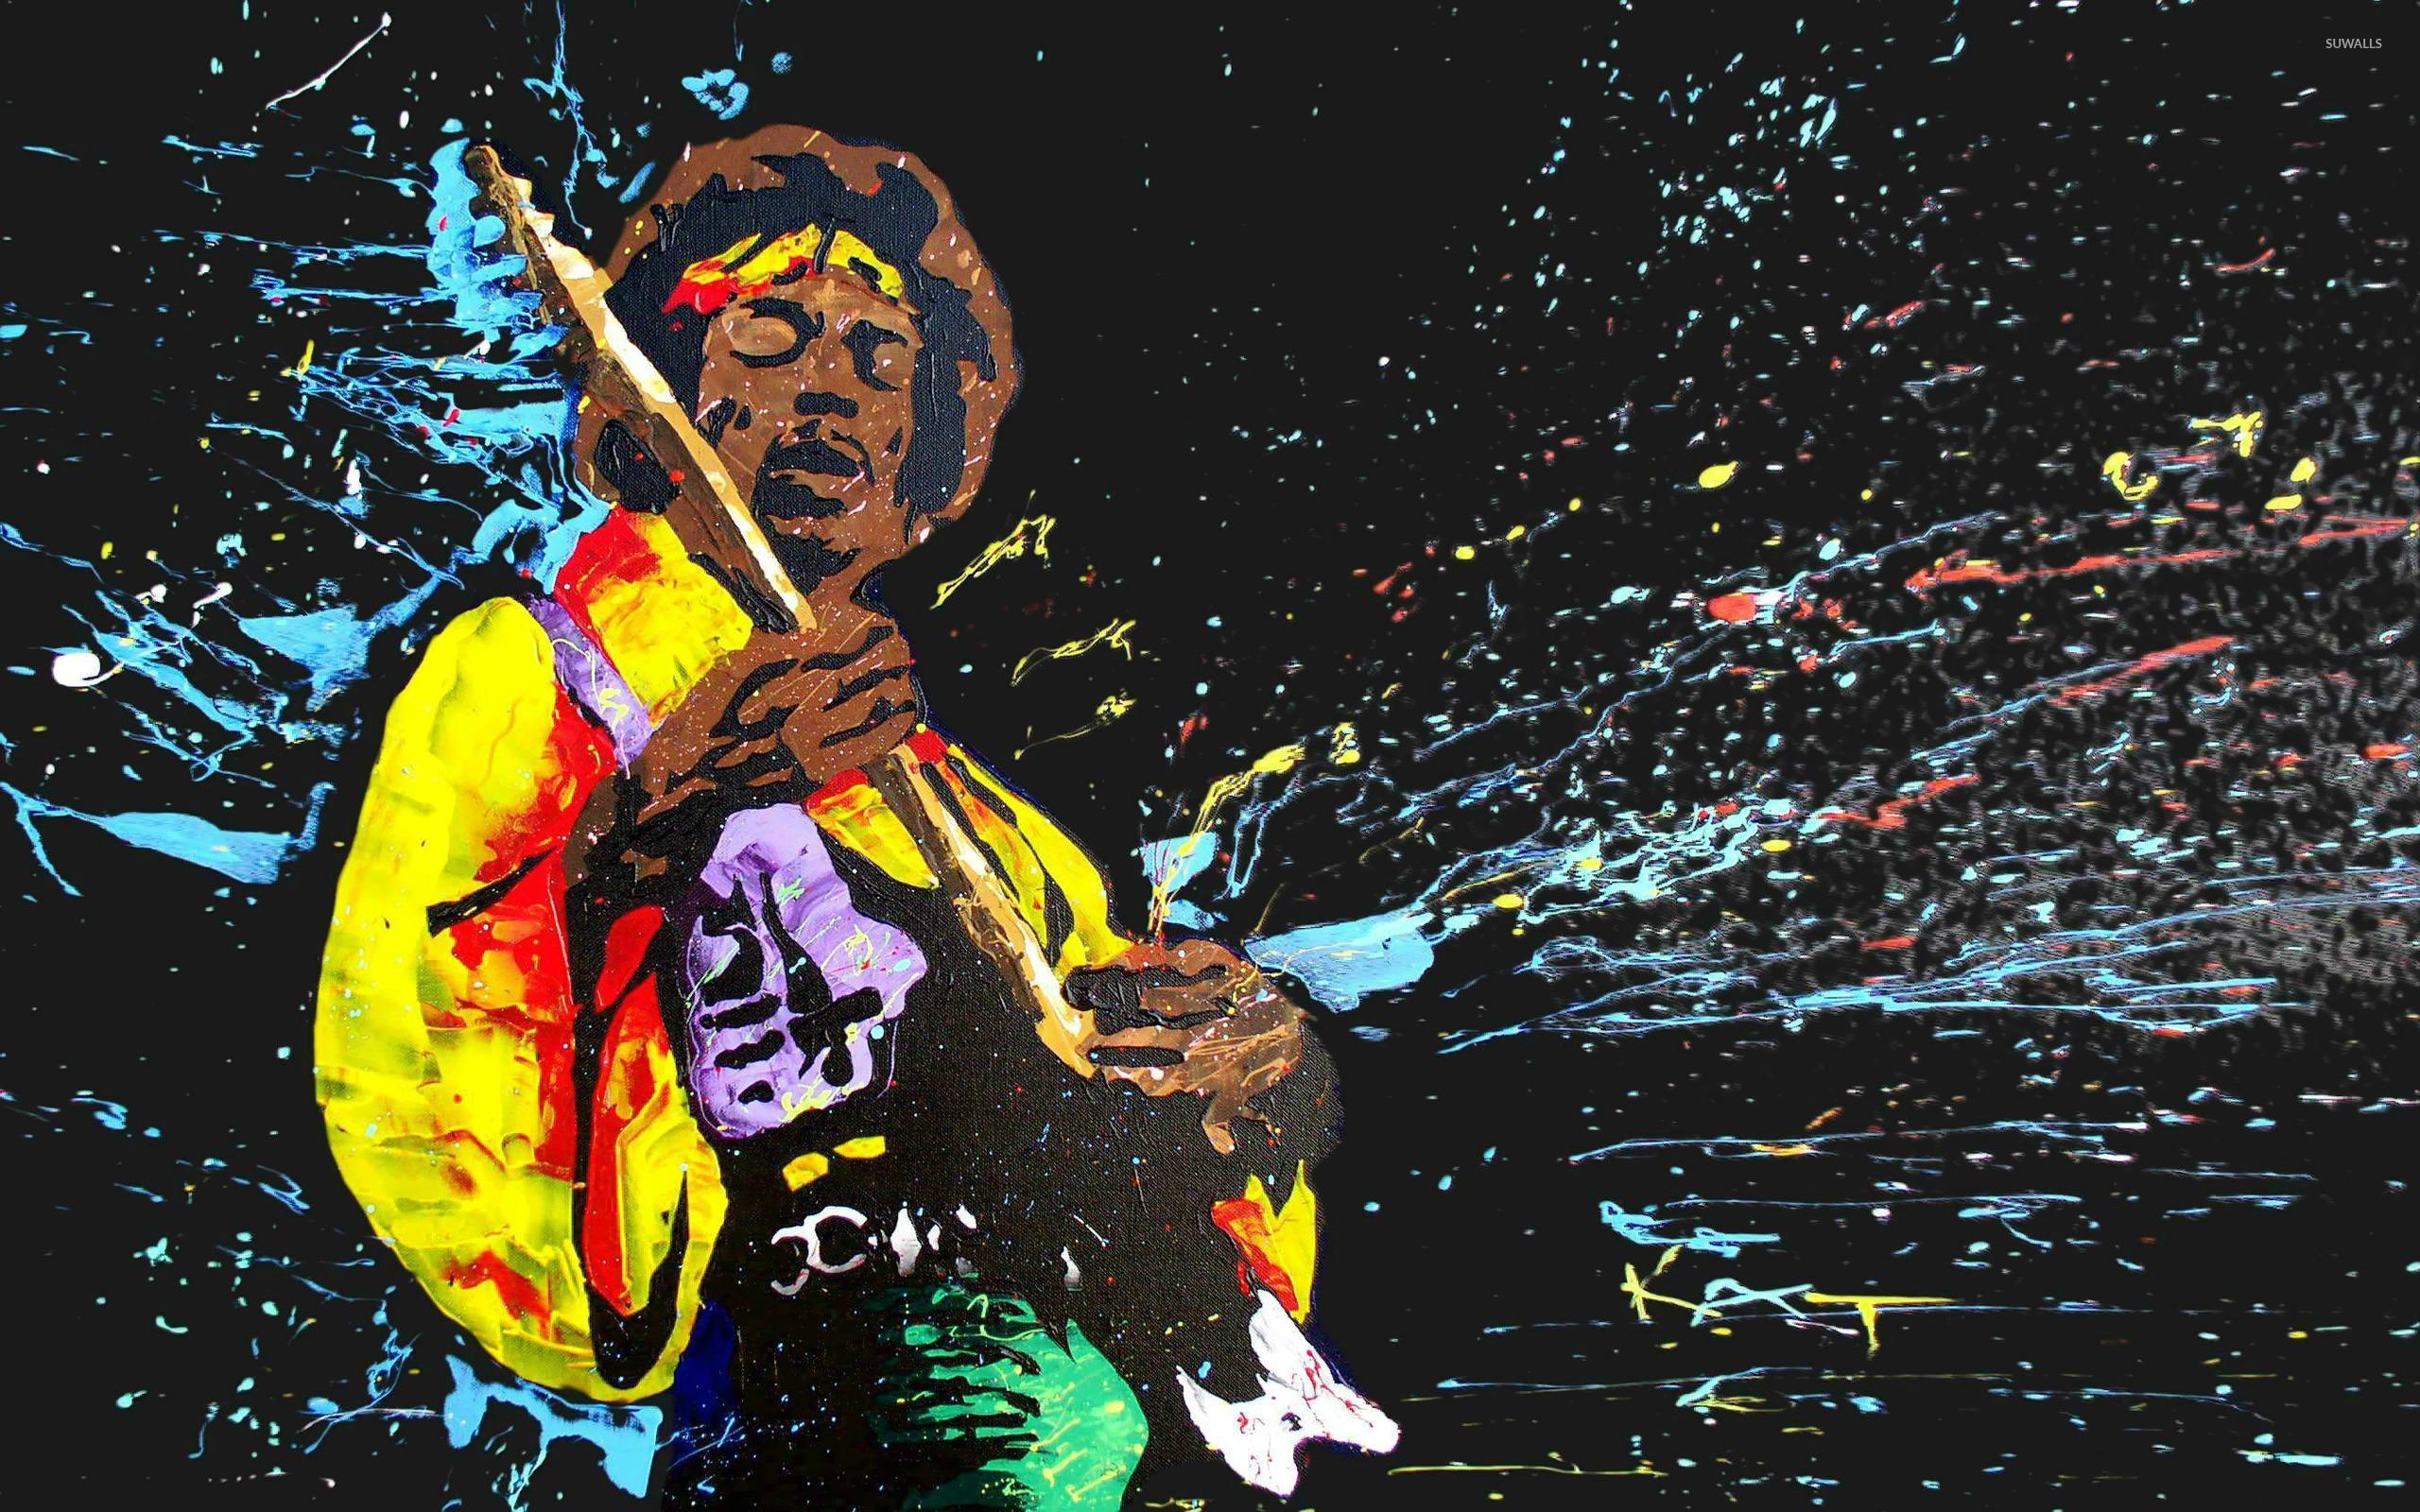 Top Wallpaper Music Painting - jimi-hendrix-painting-14403-2560x1600  Pic_388216.jpg